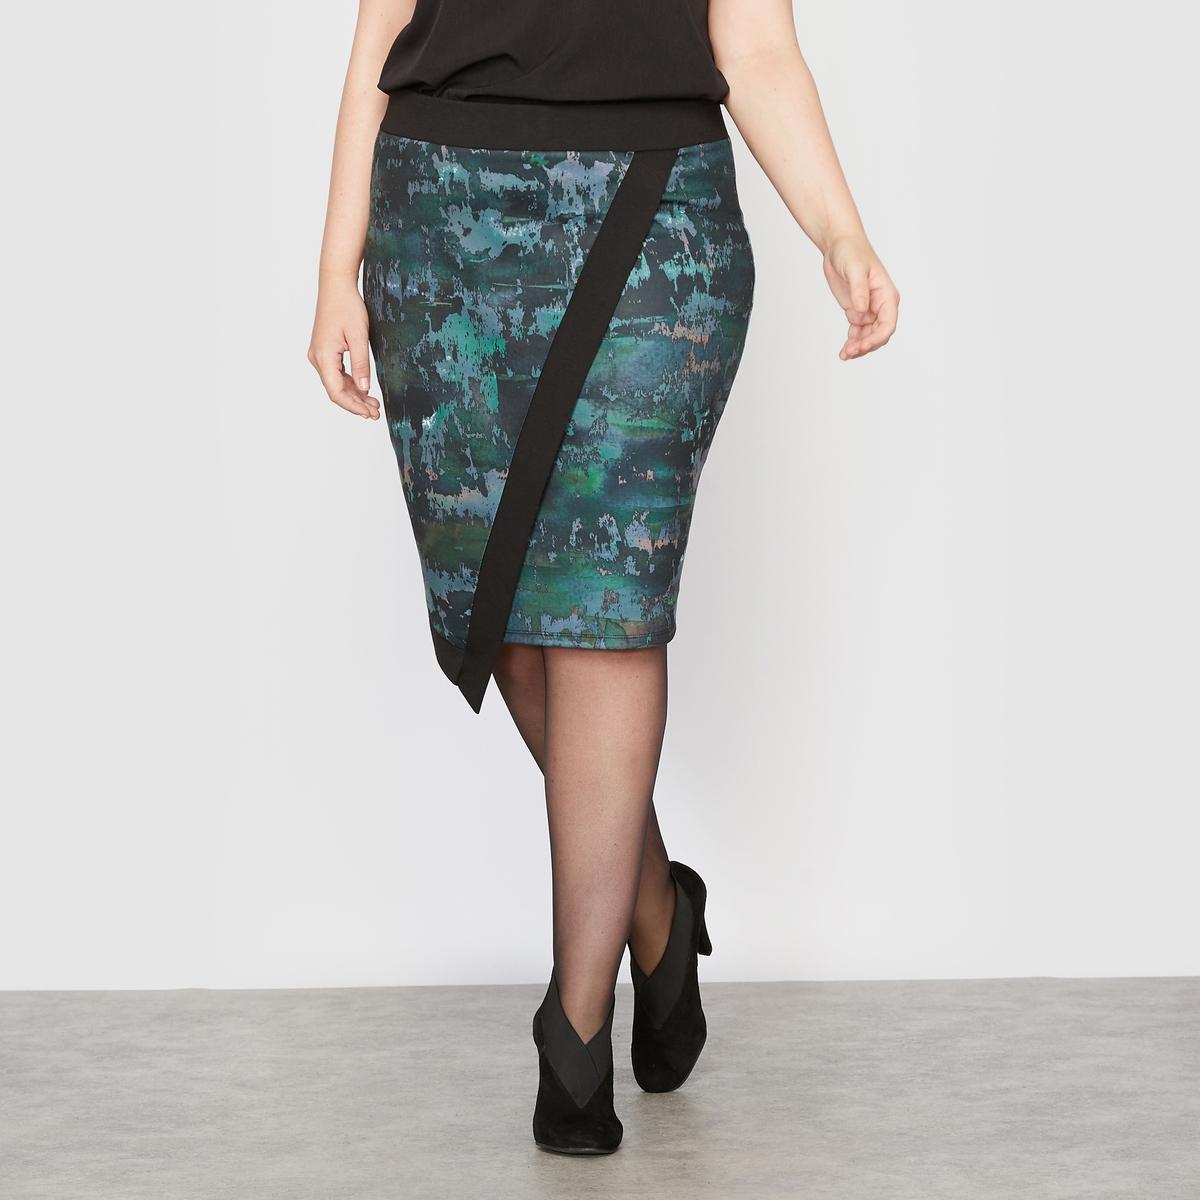 Юбка асимметричная из трикотажа с рисунком асимметричная юбка с запахом thomas wylde асимметричная юбка с запахом